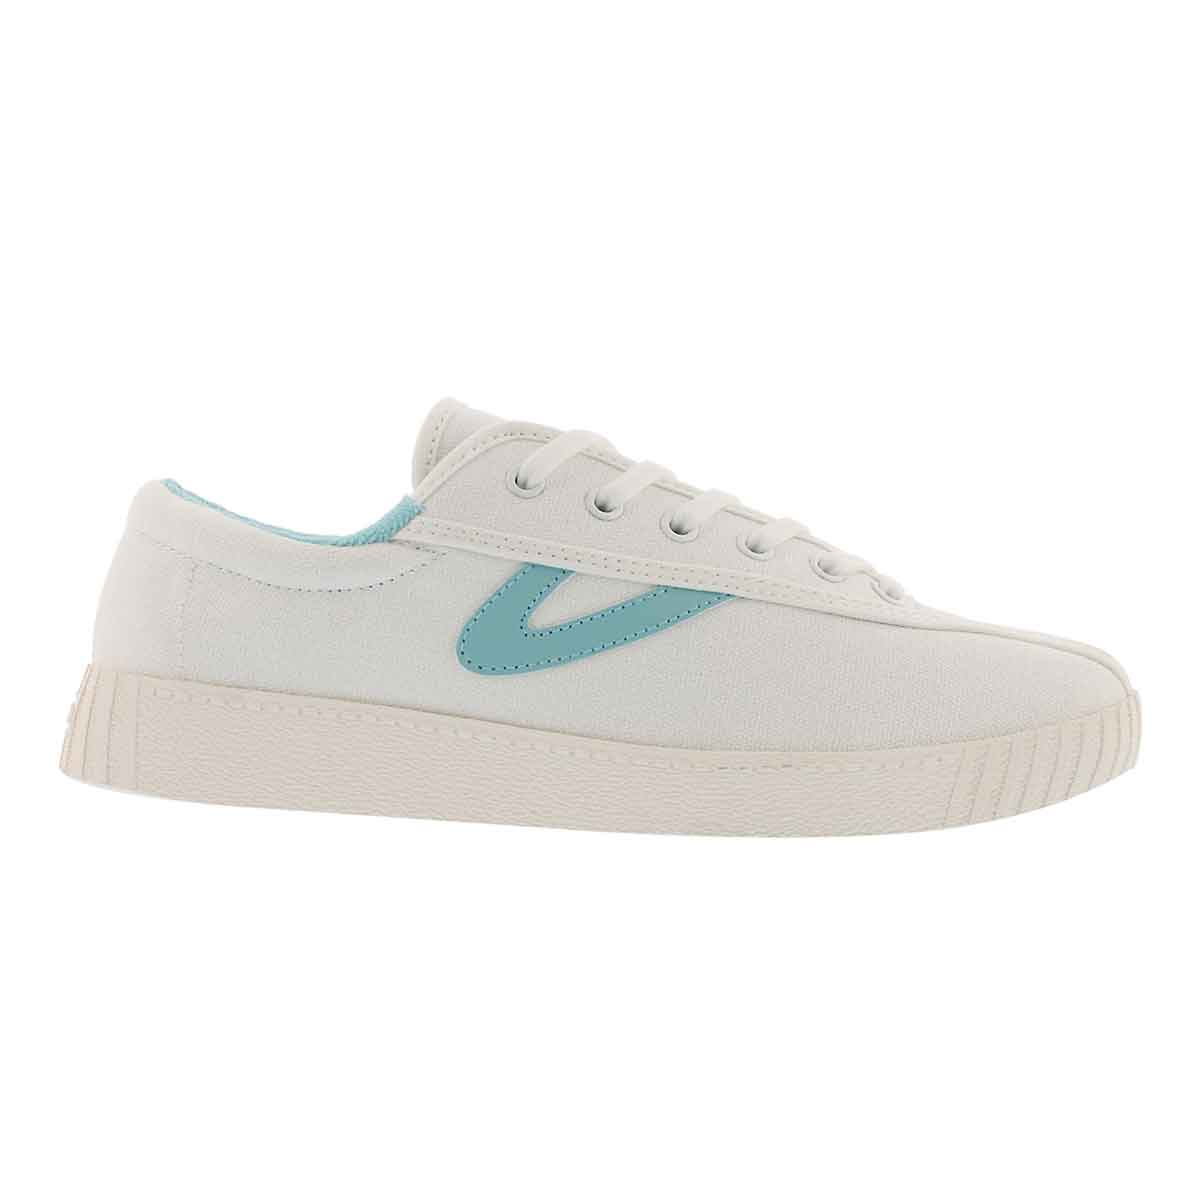 Lds Nylite Plus white/blue sneaker